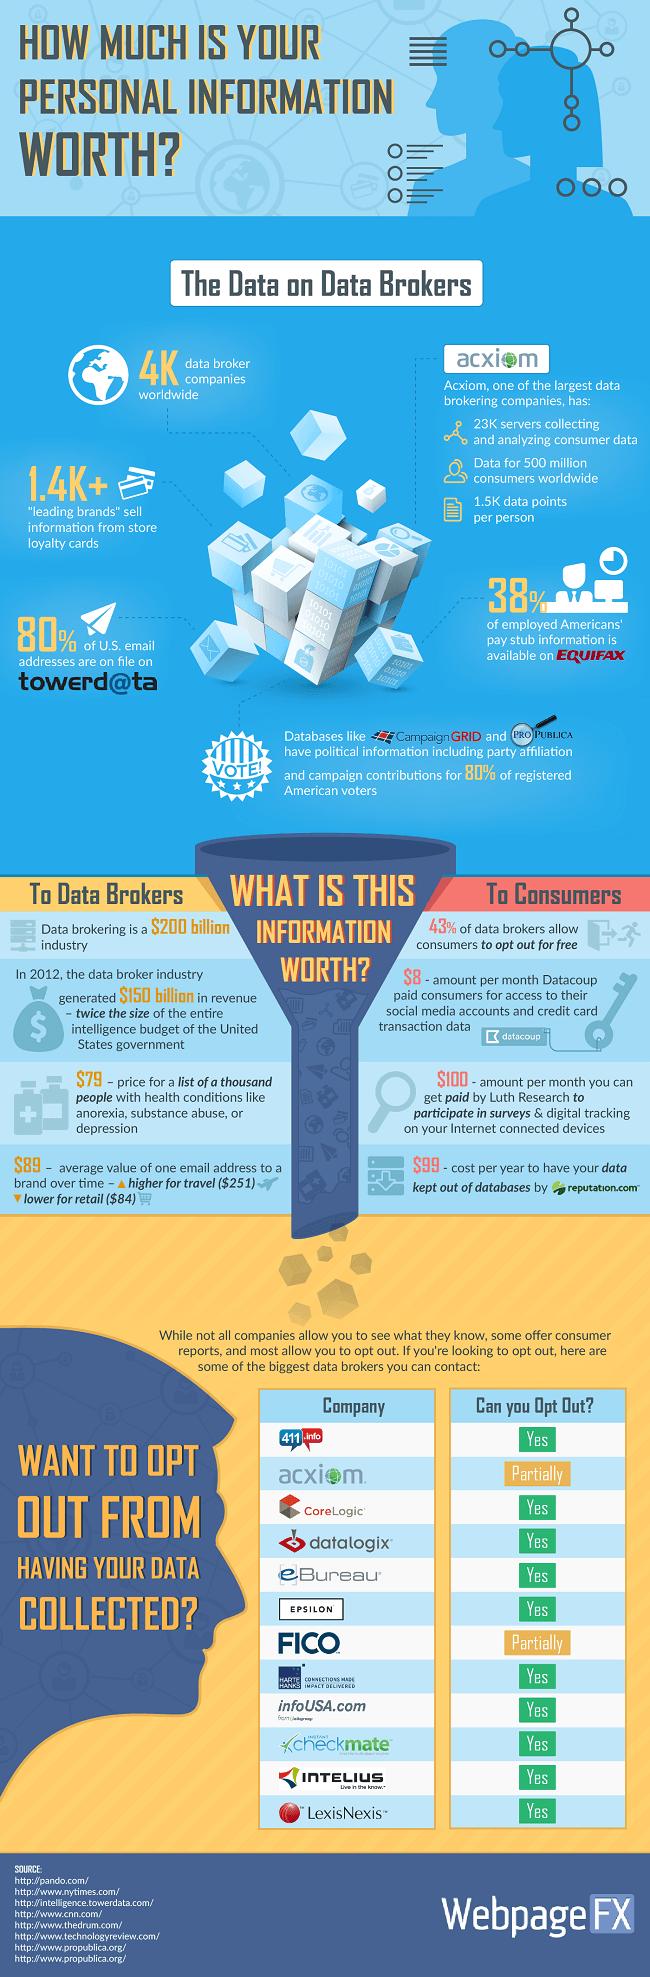 data-broker-infographic